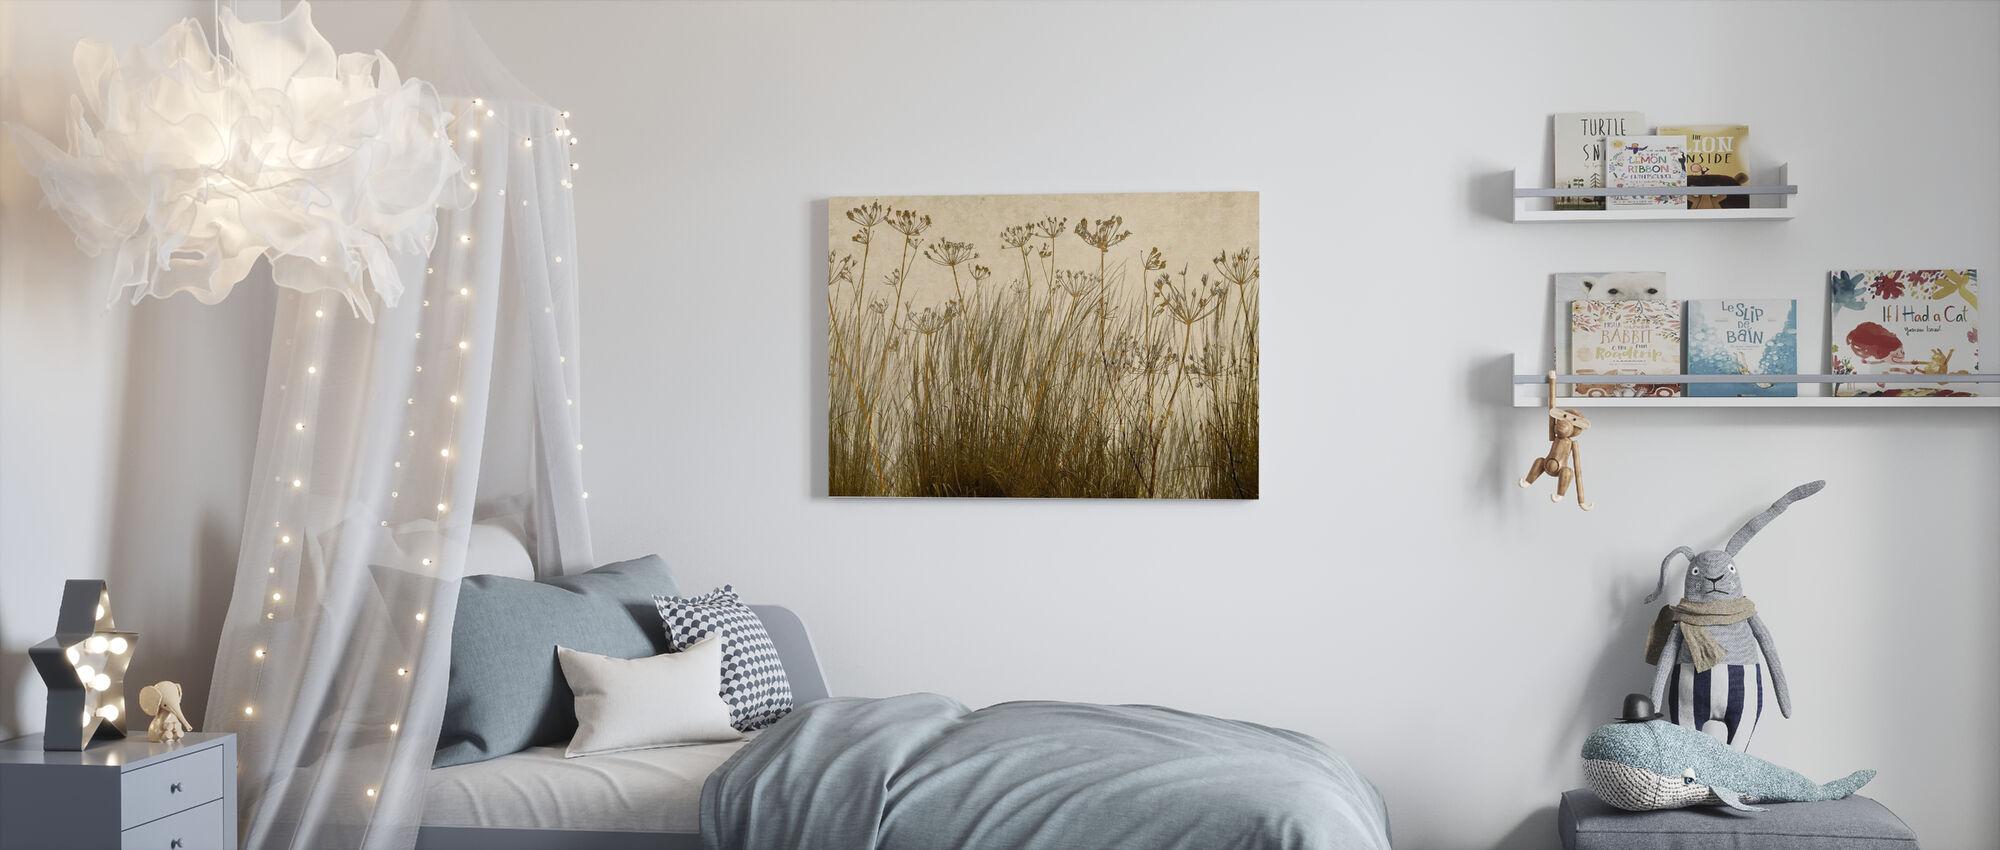 Golden Grass Silhouette - Canvas print - Kids Room